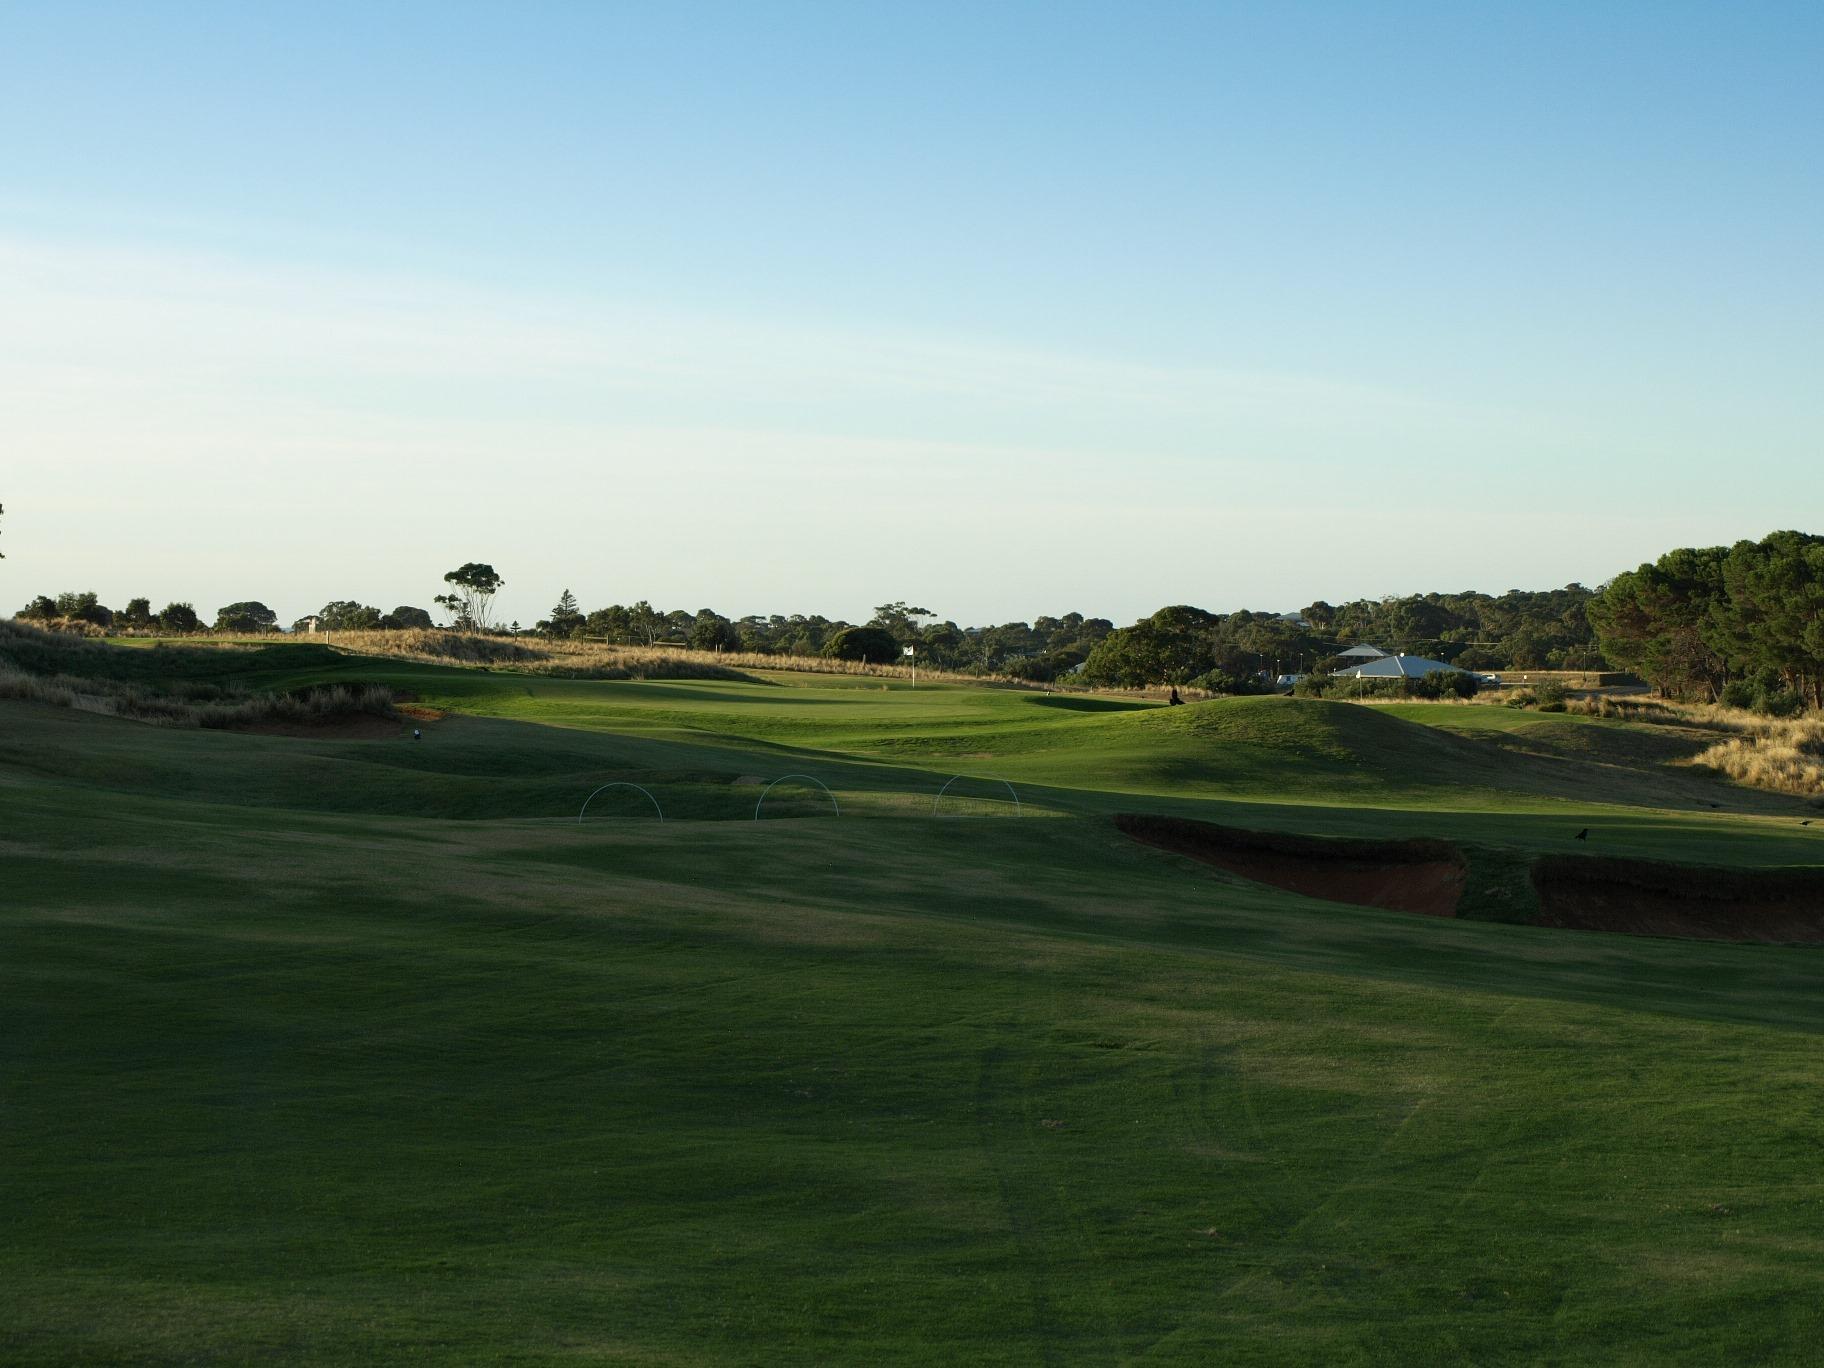 links lady bay golf resort 16th fairway aussie golf quest. Black Bedroom Furniture Sets. Home Design Ideas